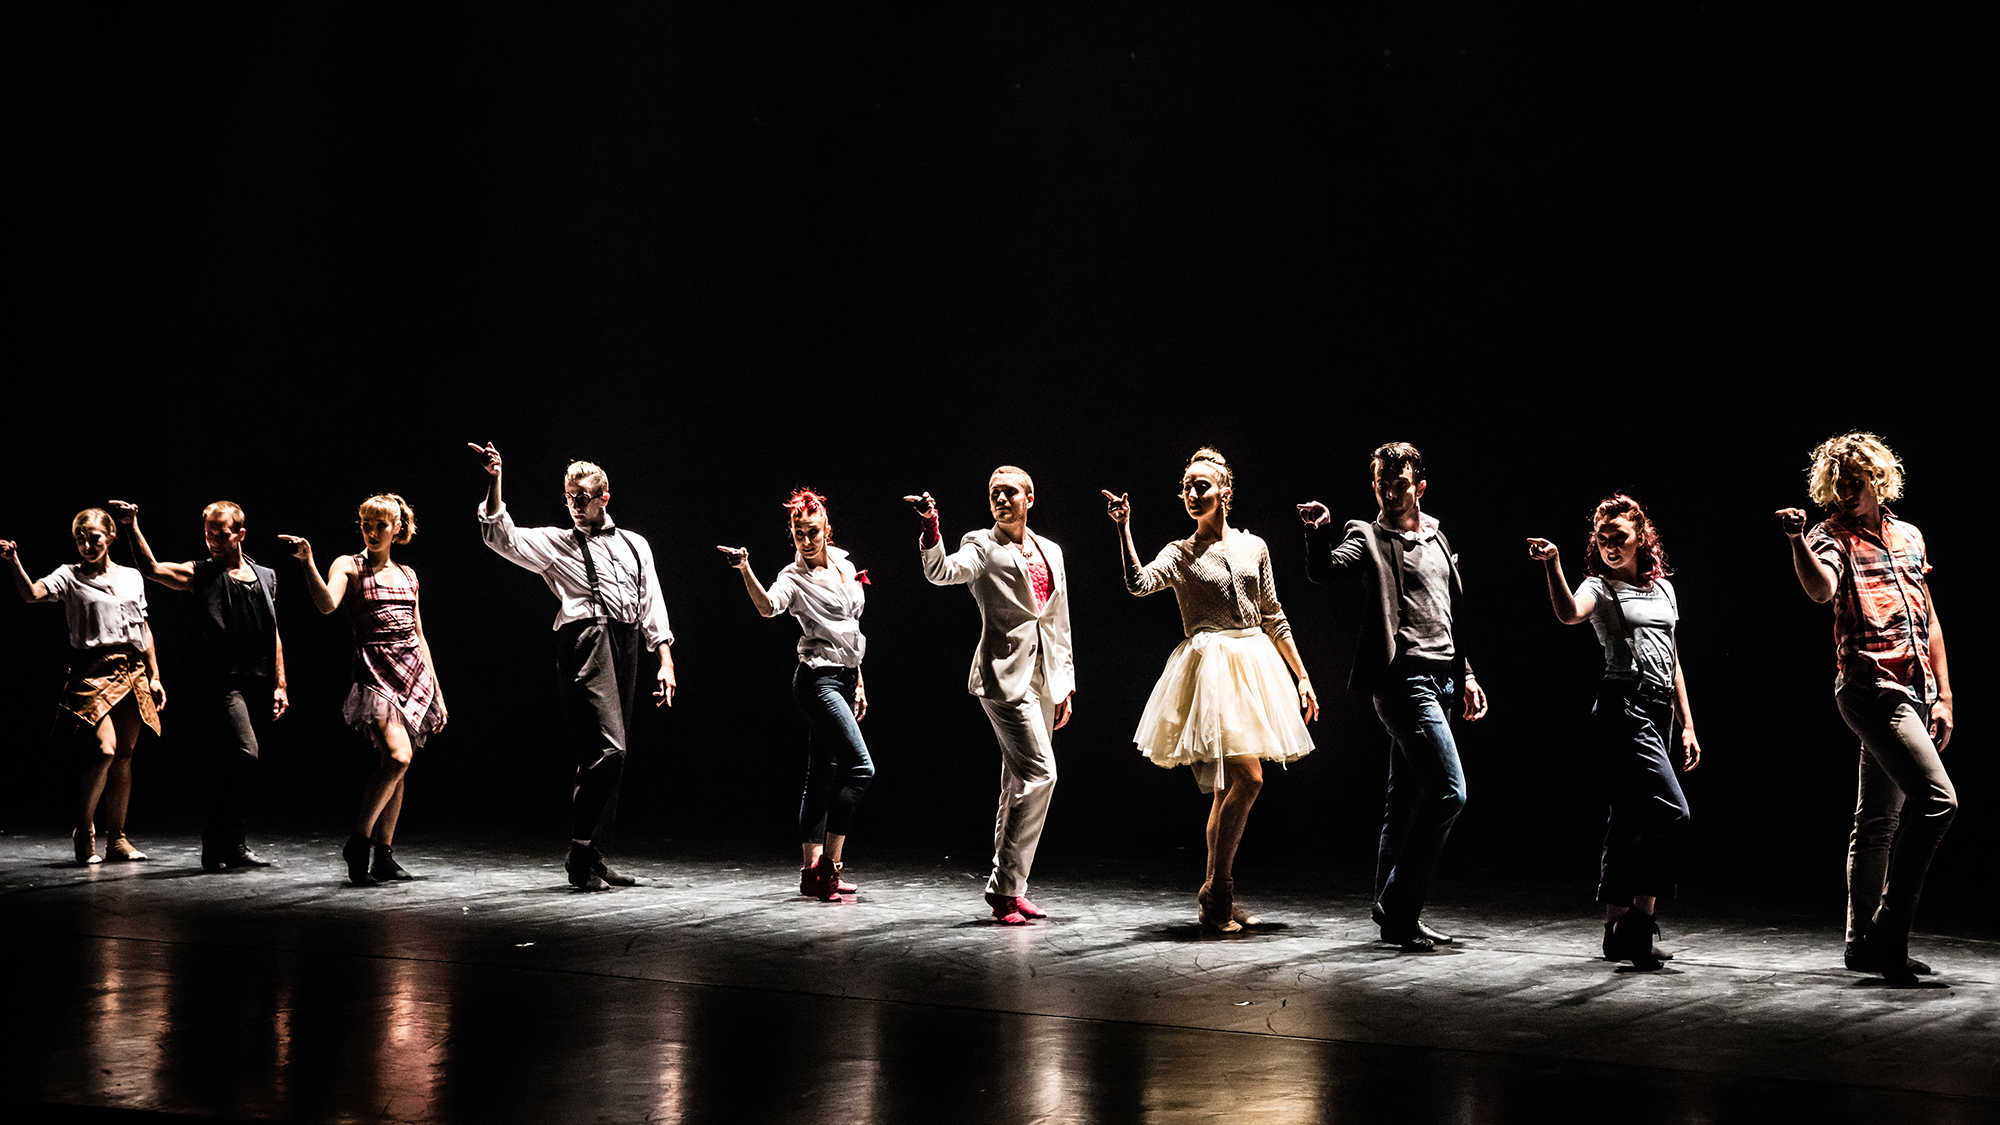 BJM – Les Ballets Jazz De Montréal - Itzik Galili - O Balcão de Amor